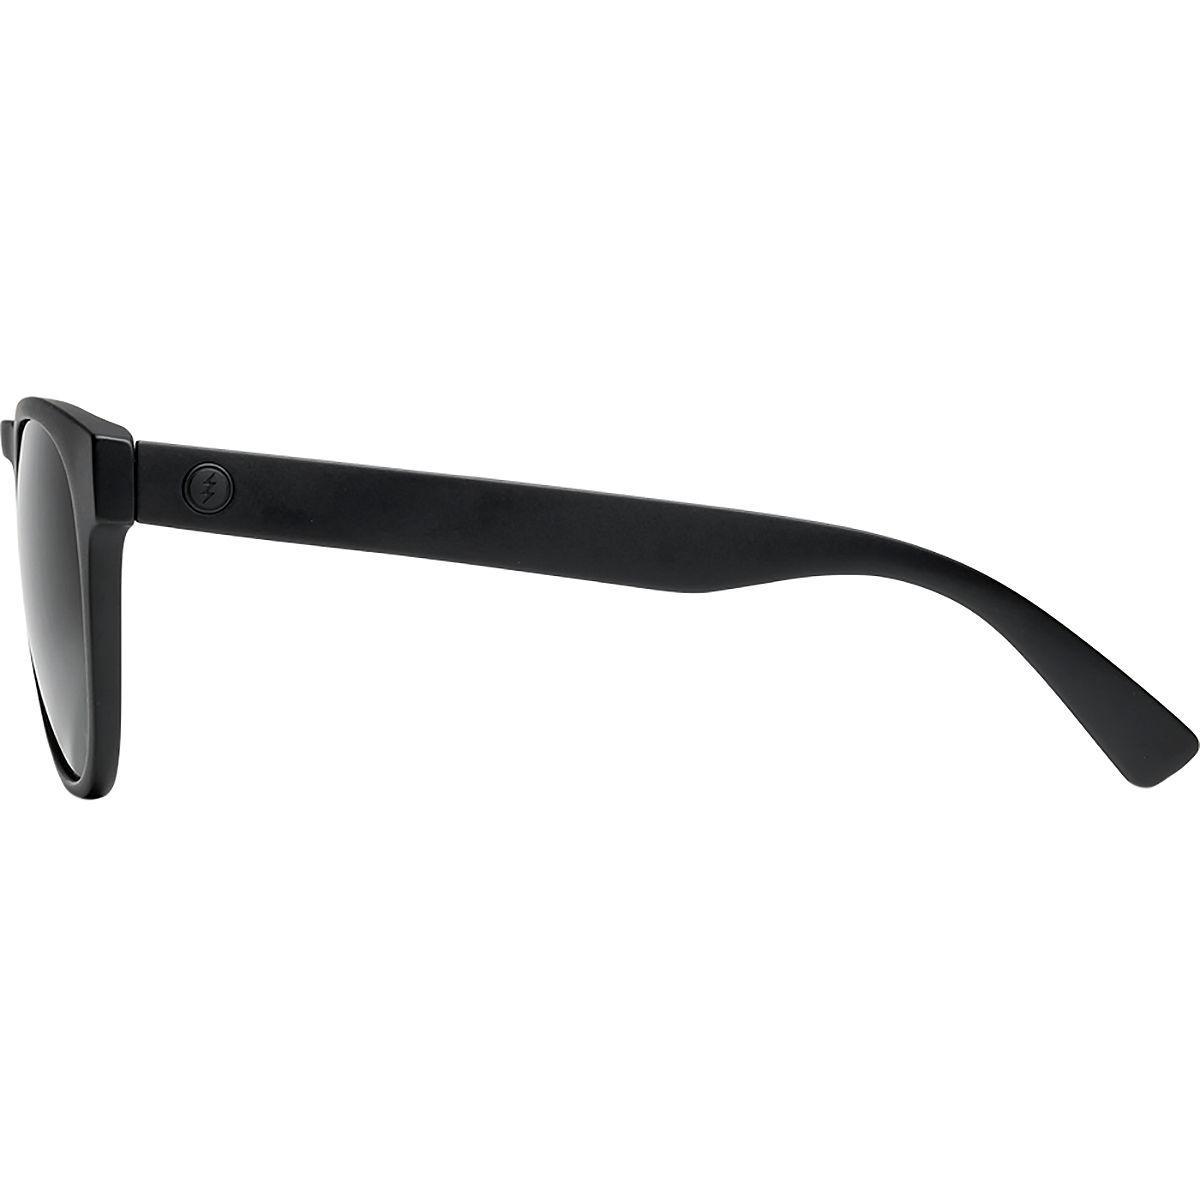 5eeeaf94989 ... Nashville Xl Sunglasses for Men - Lyst. View fullscreen